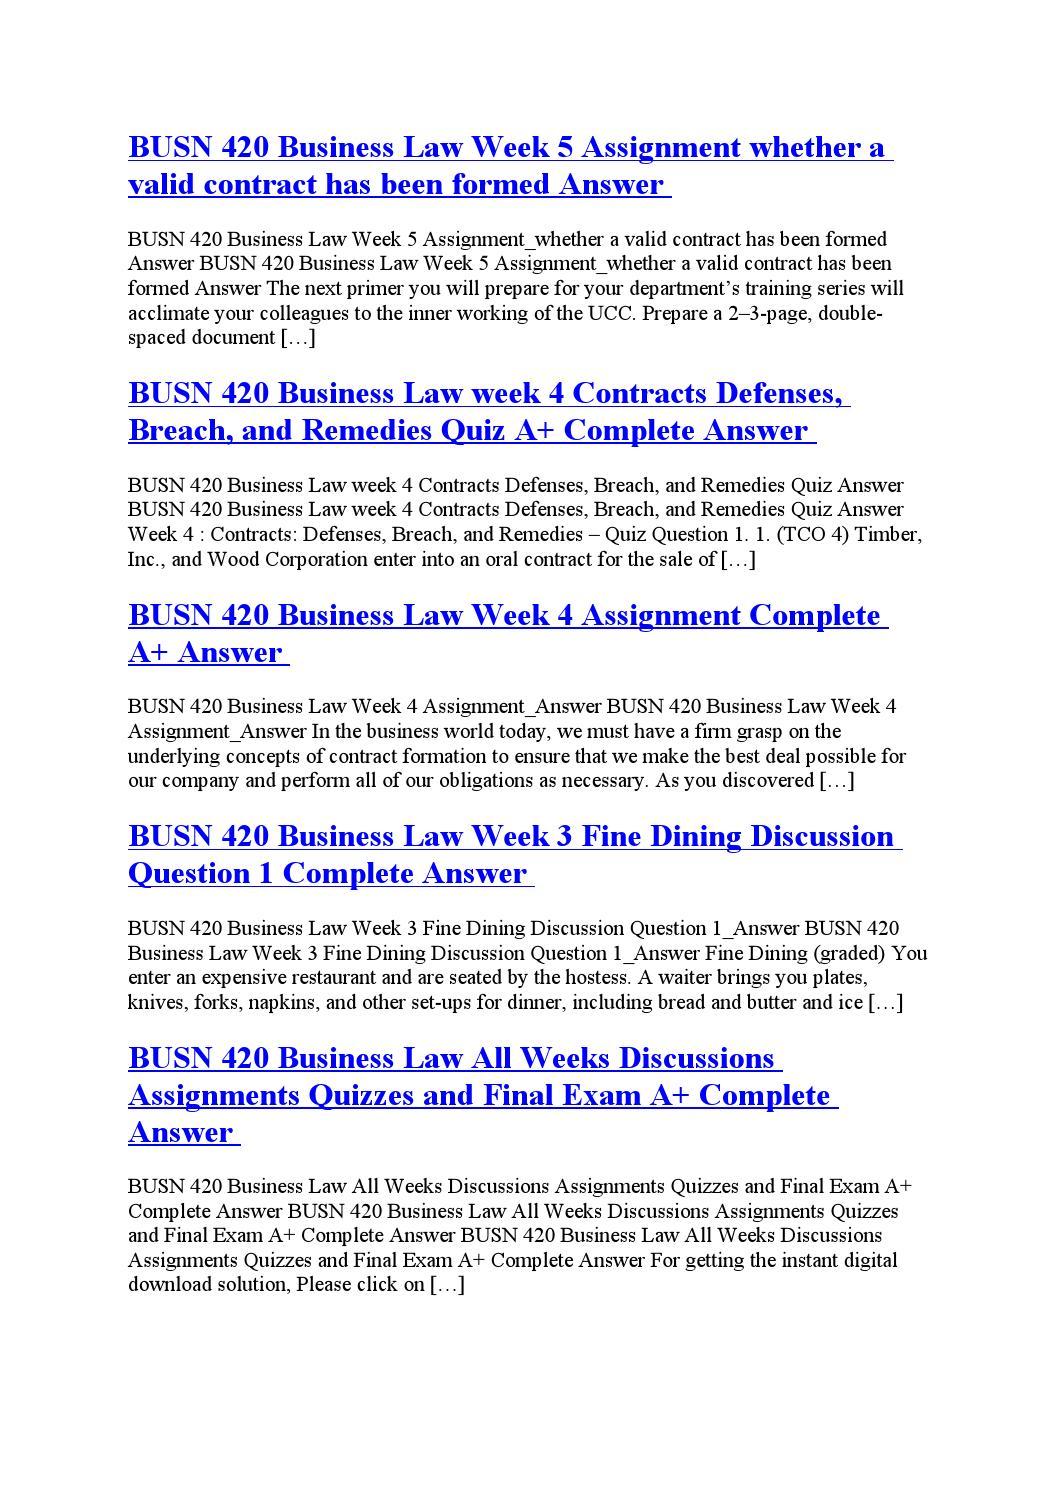 Homework search engines websites